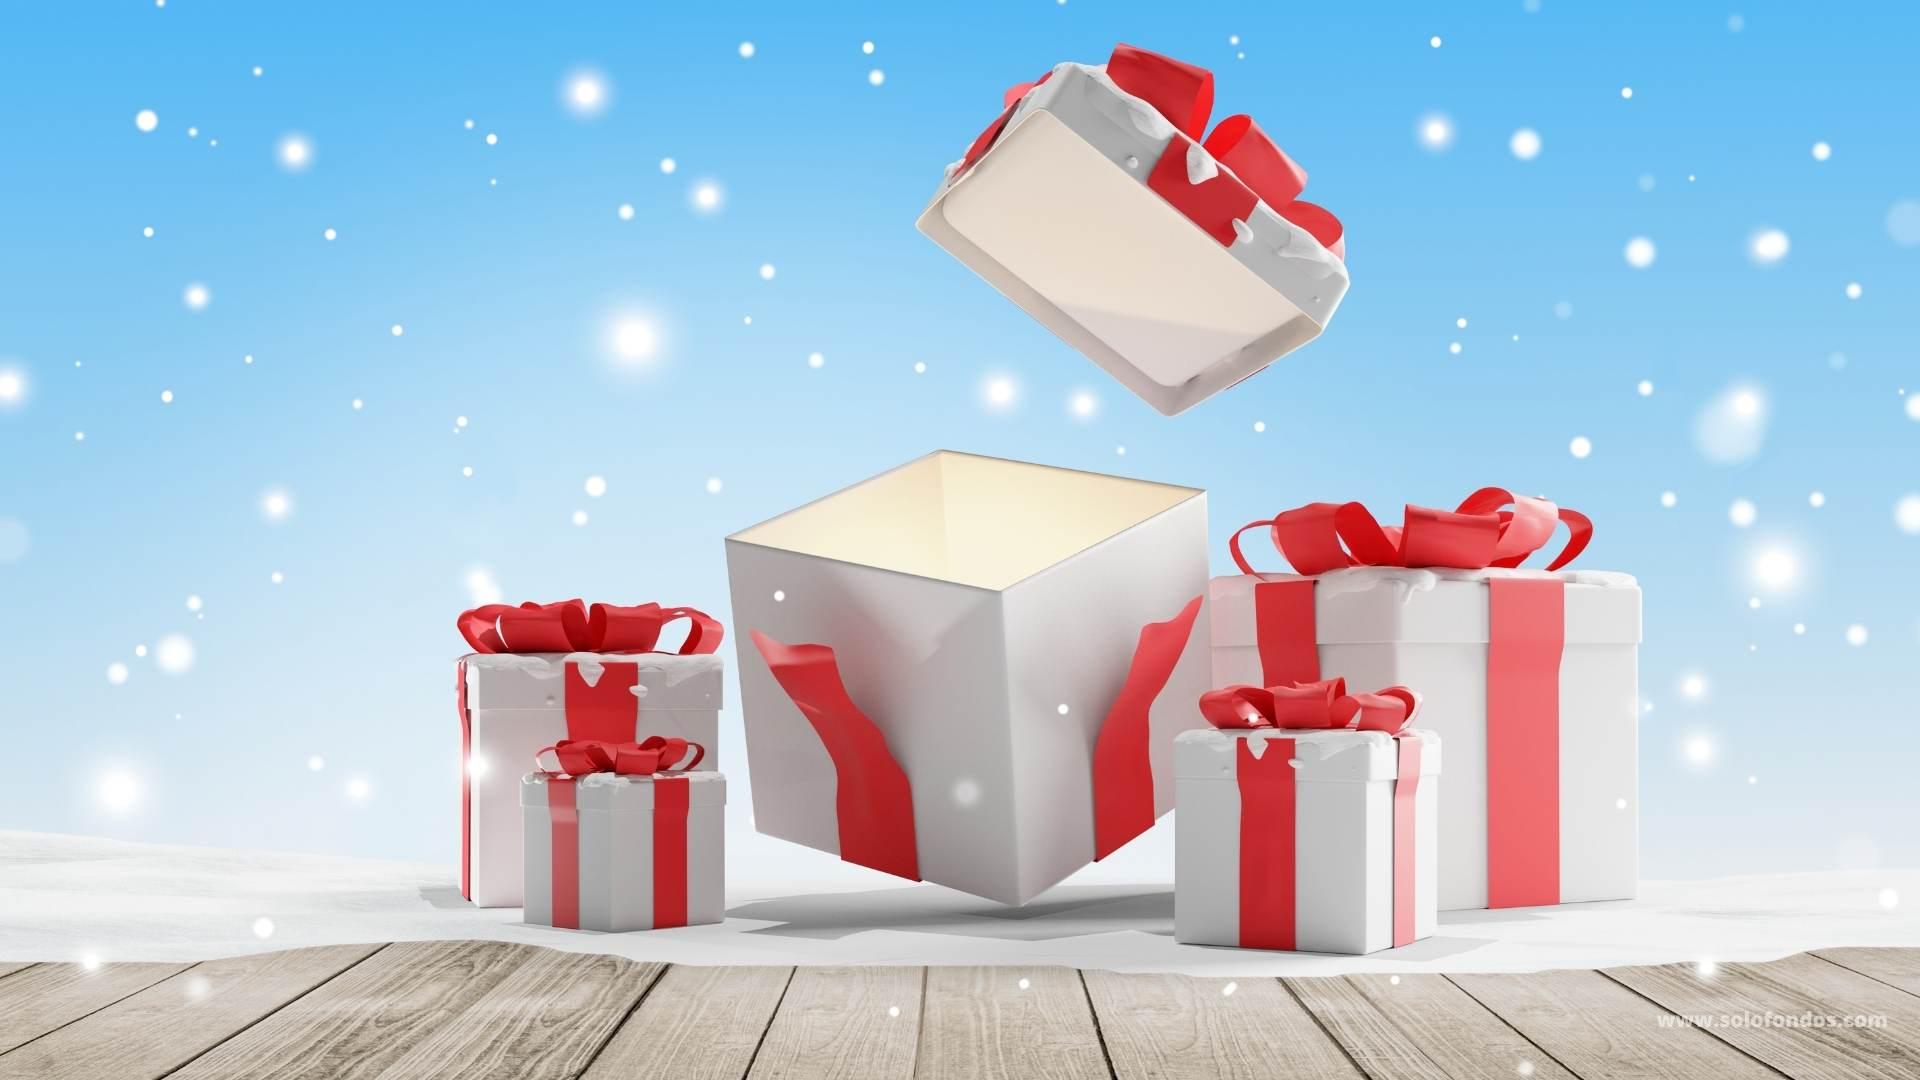 fondos navidad